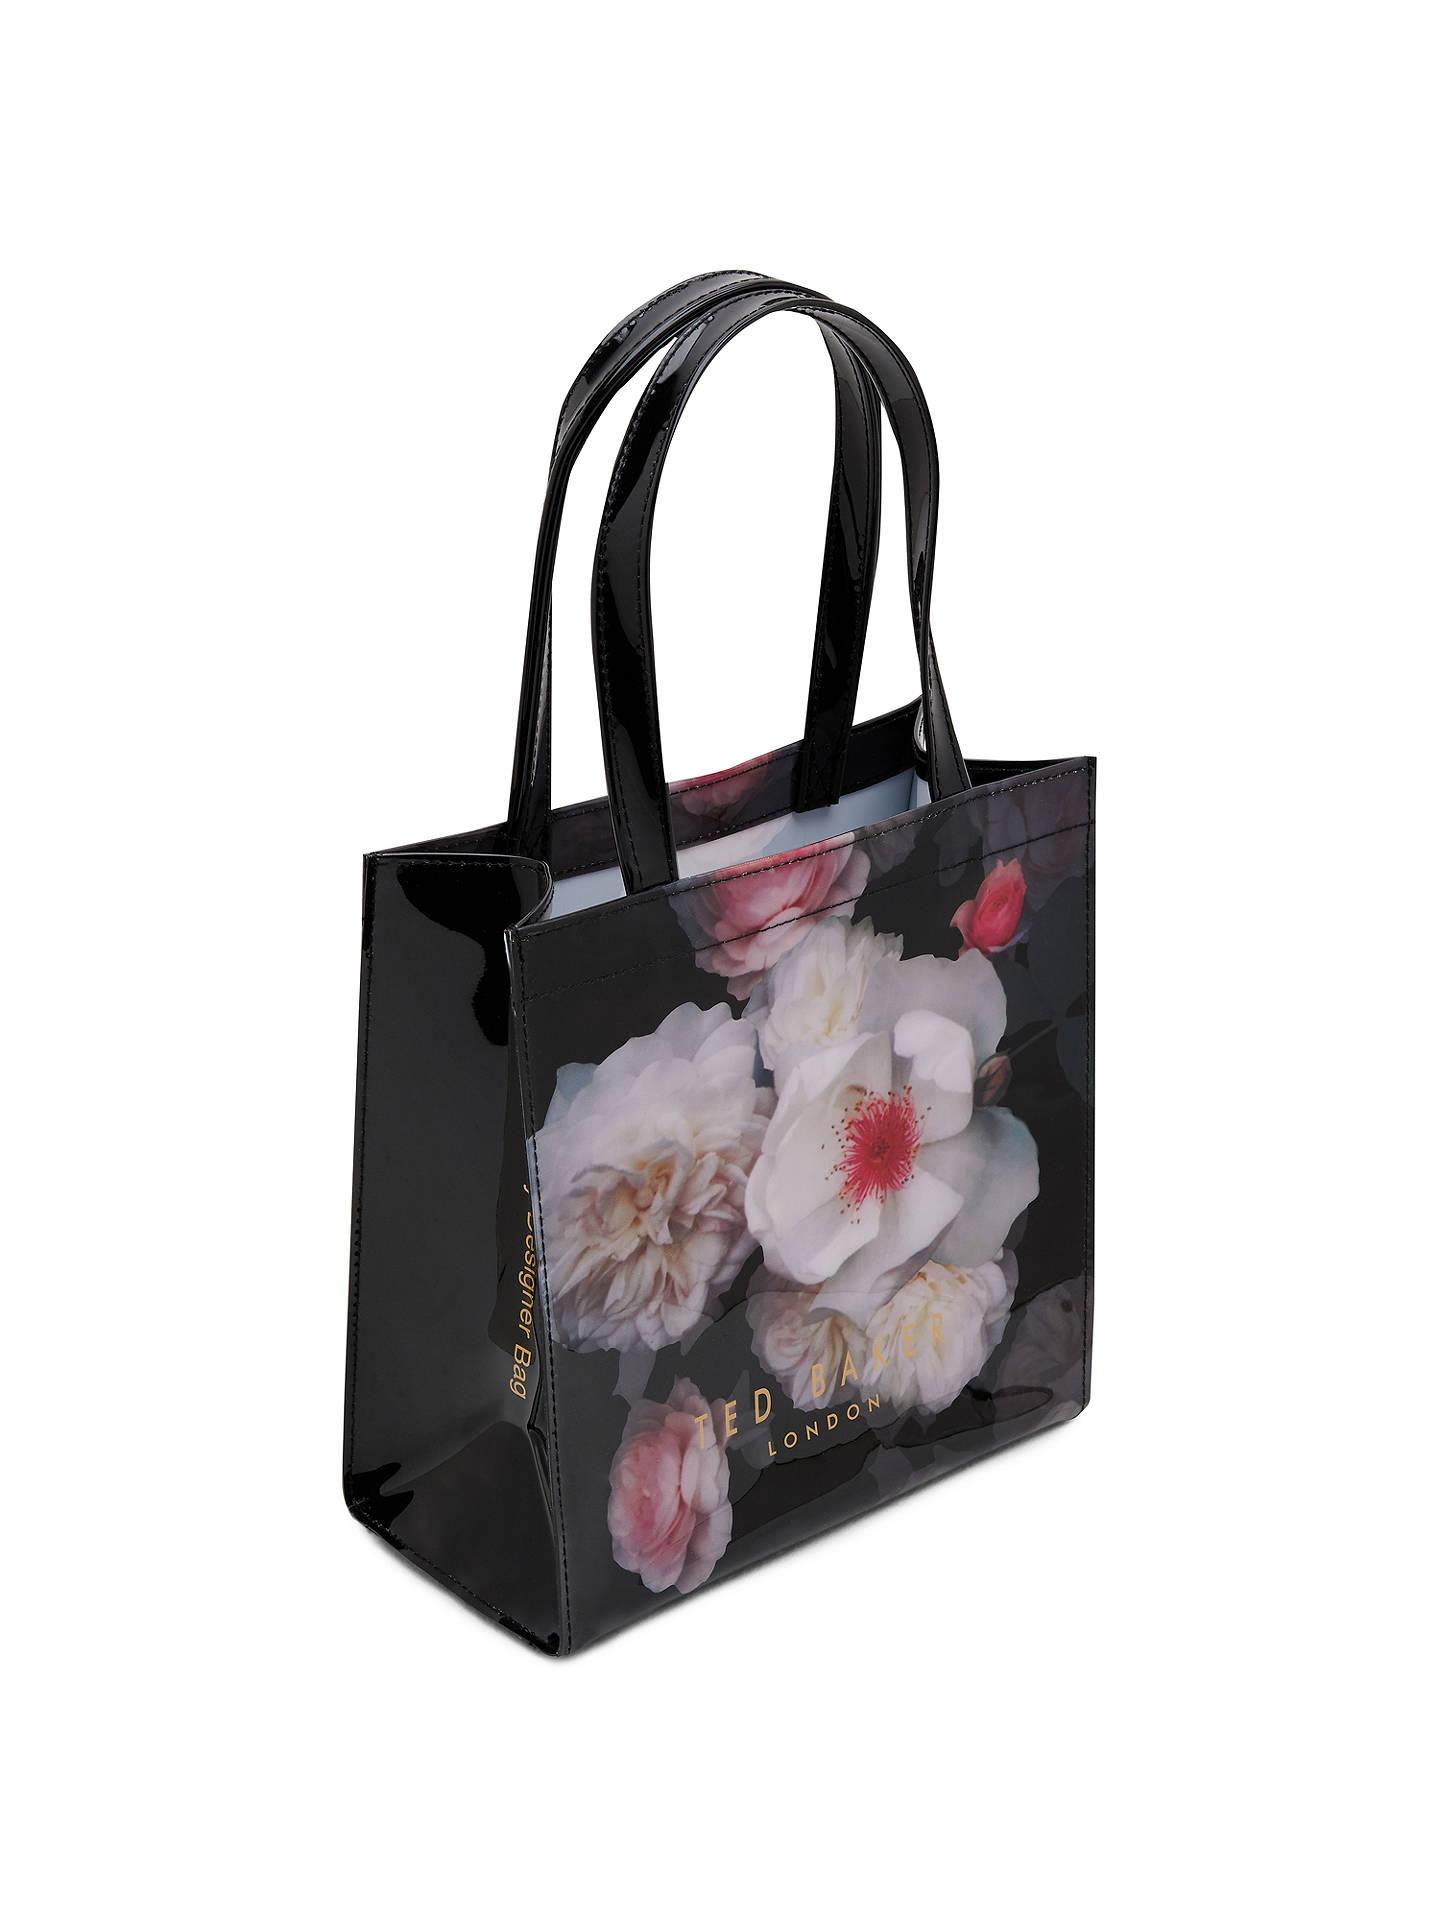 b074e684f4c08 ... Buy Ted Baker Taracon Chelsea Grey Large Shopper Bag